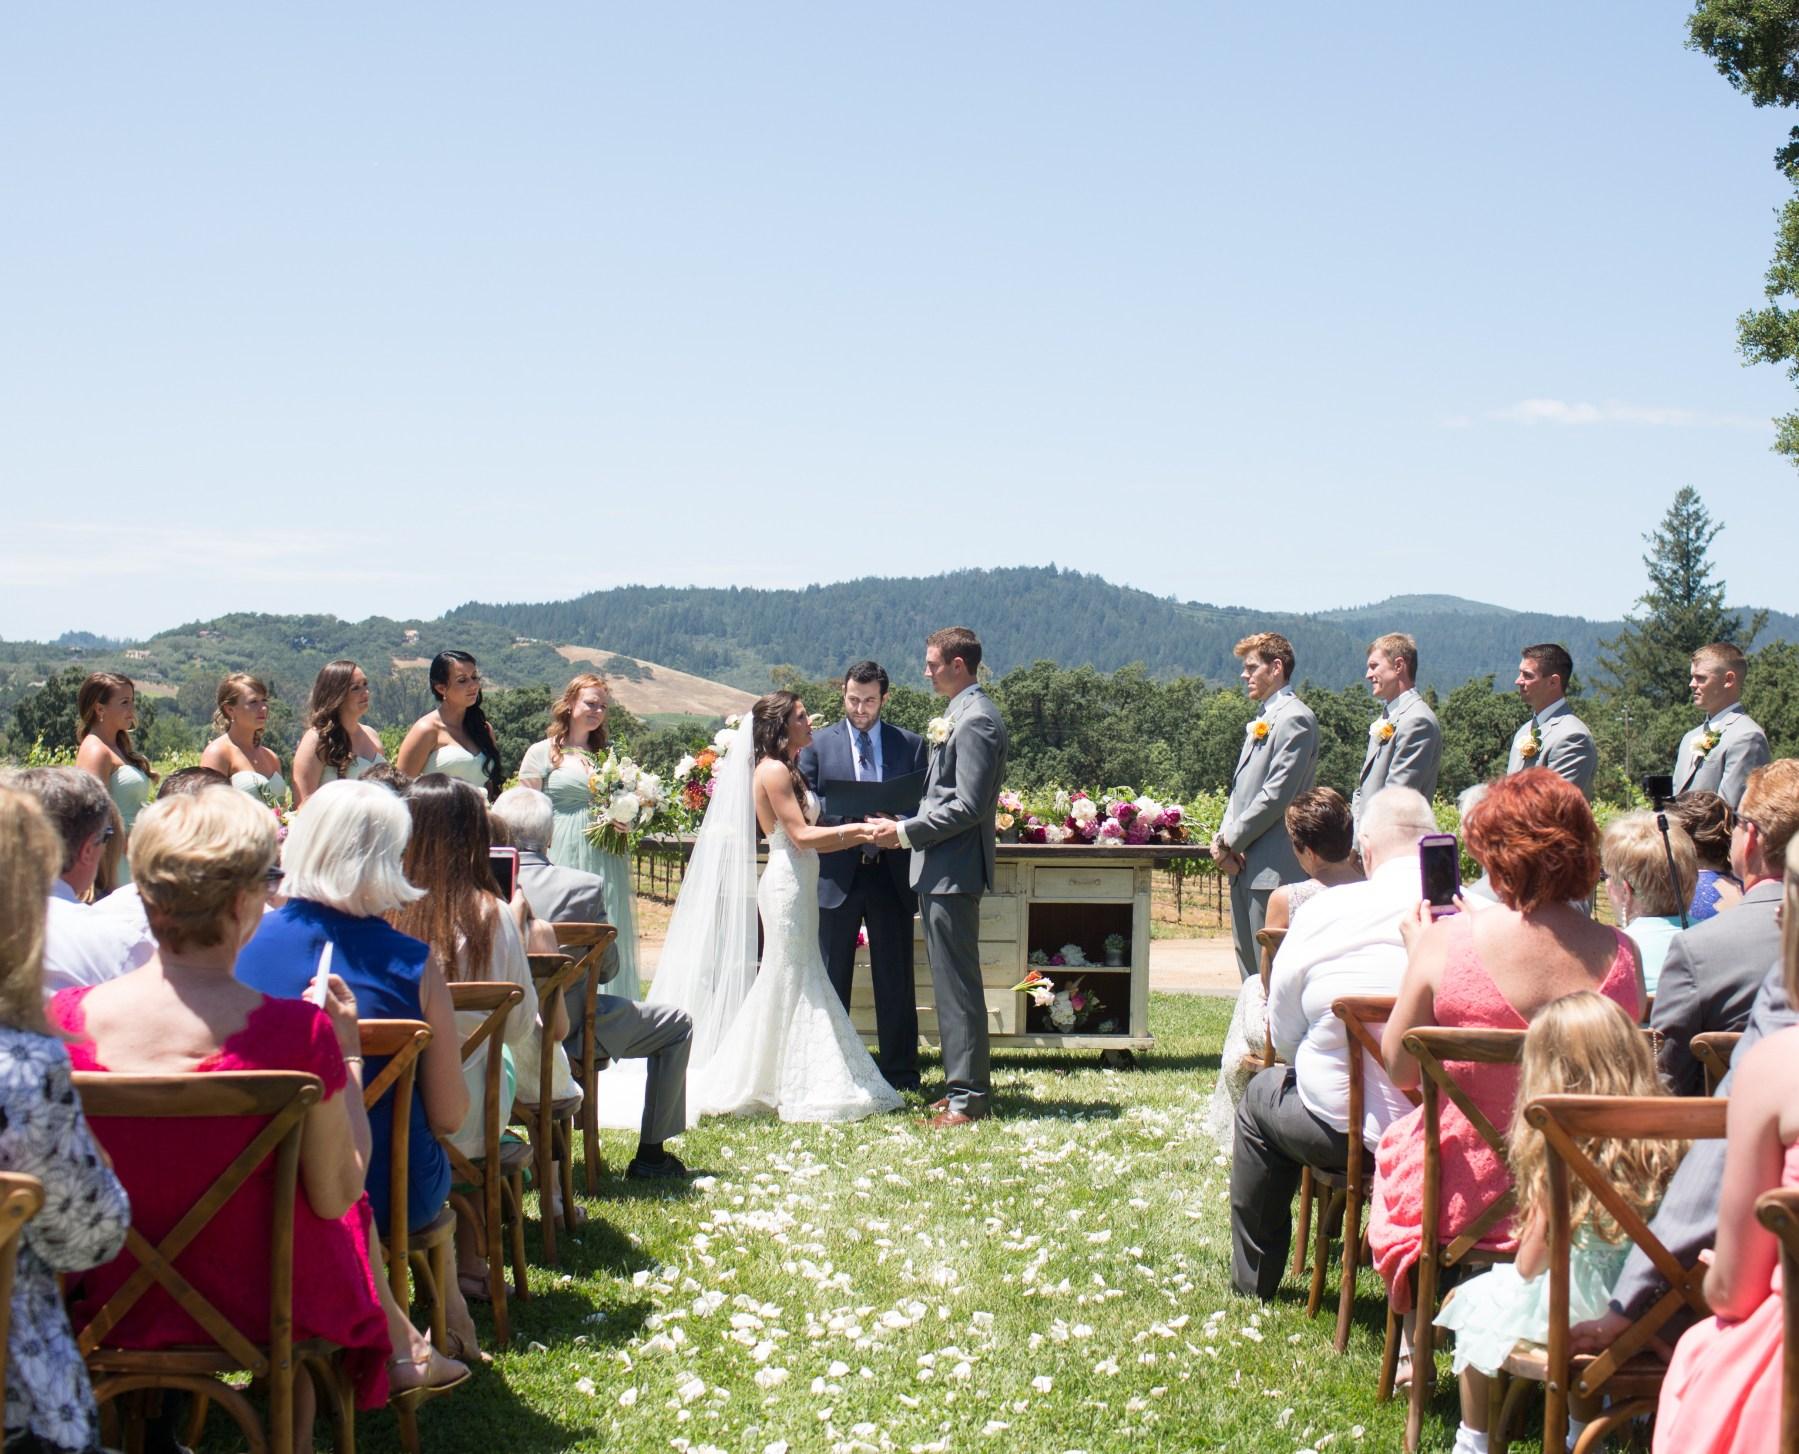 wine-country-wedding-stylemindchic-jasminestar-theknot and the wedding ceremony in wine country